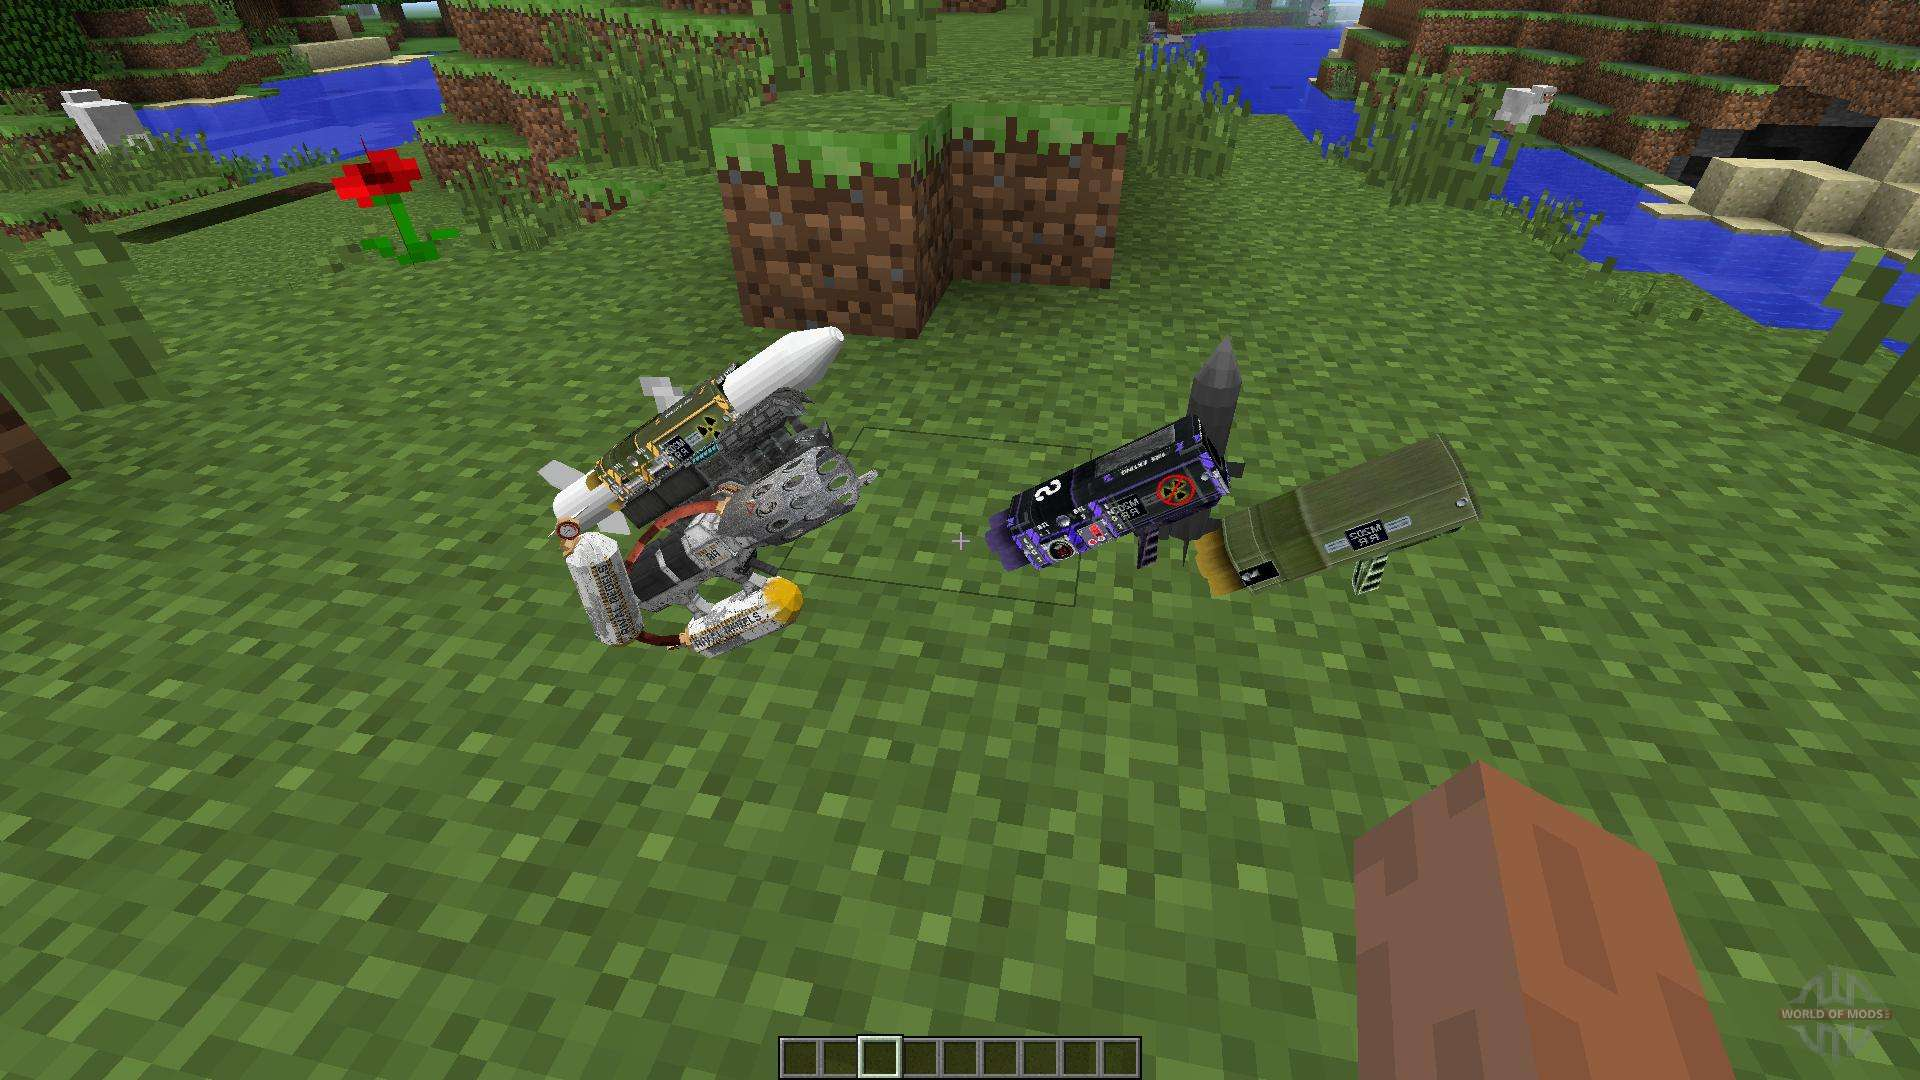 minecraft rival rebels mod 1.8 download